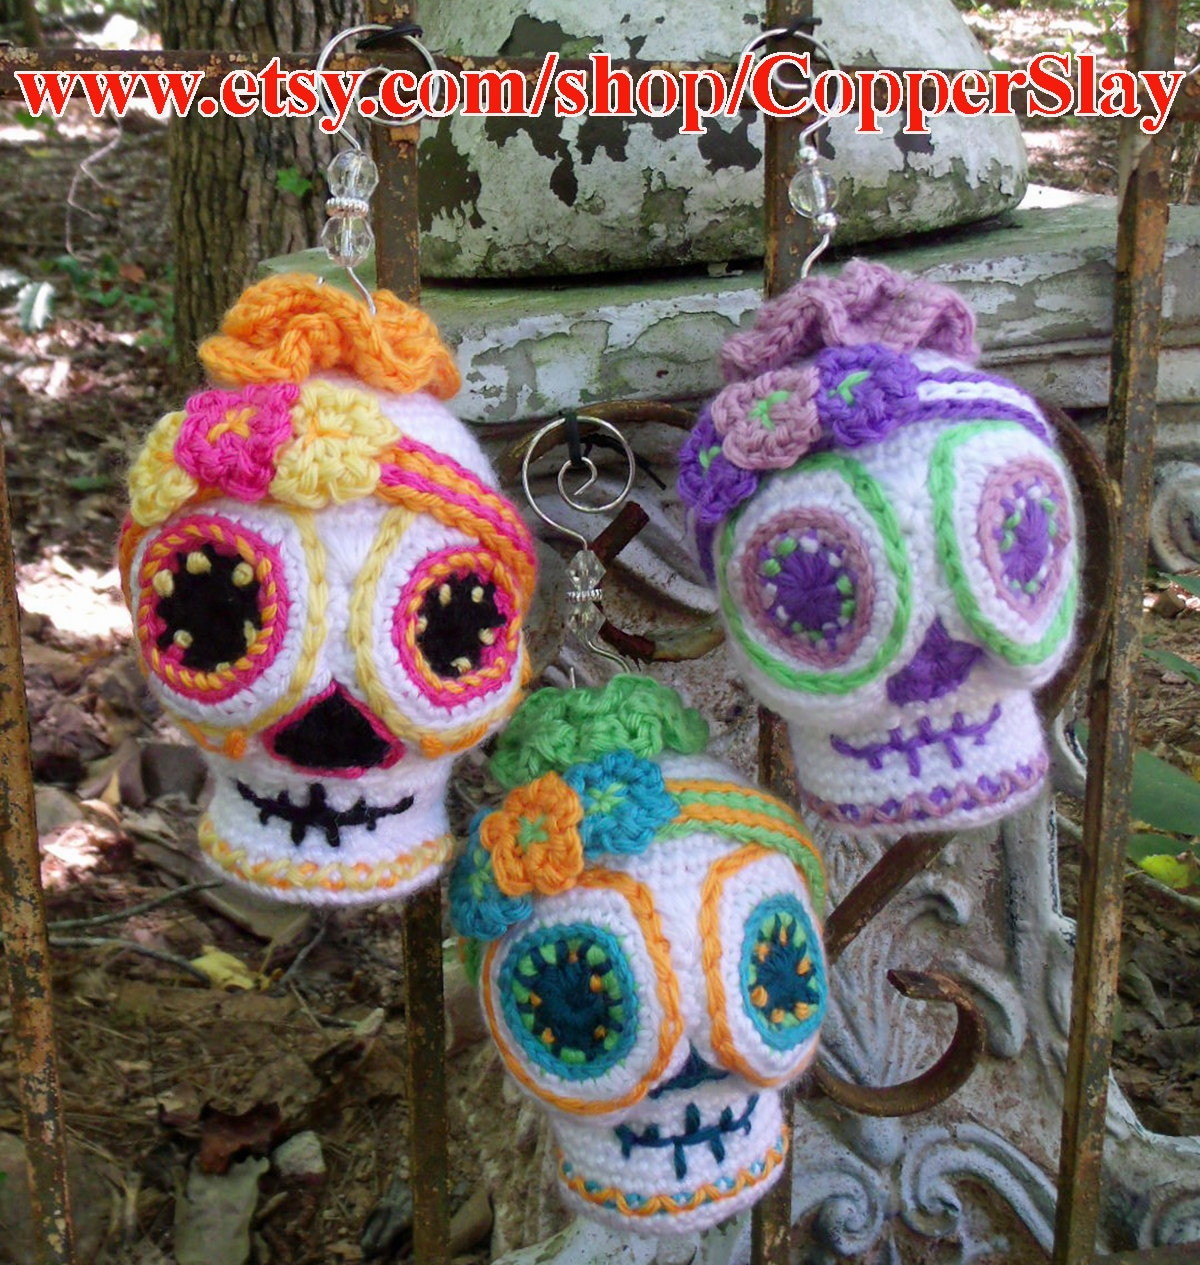 Sugar Skull Crochet Pattern Amigurumi Day of the Dead Halloween crochet ornament decor doll SugarSpun Skullz by CopperSlay